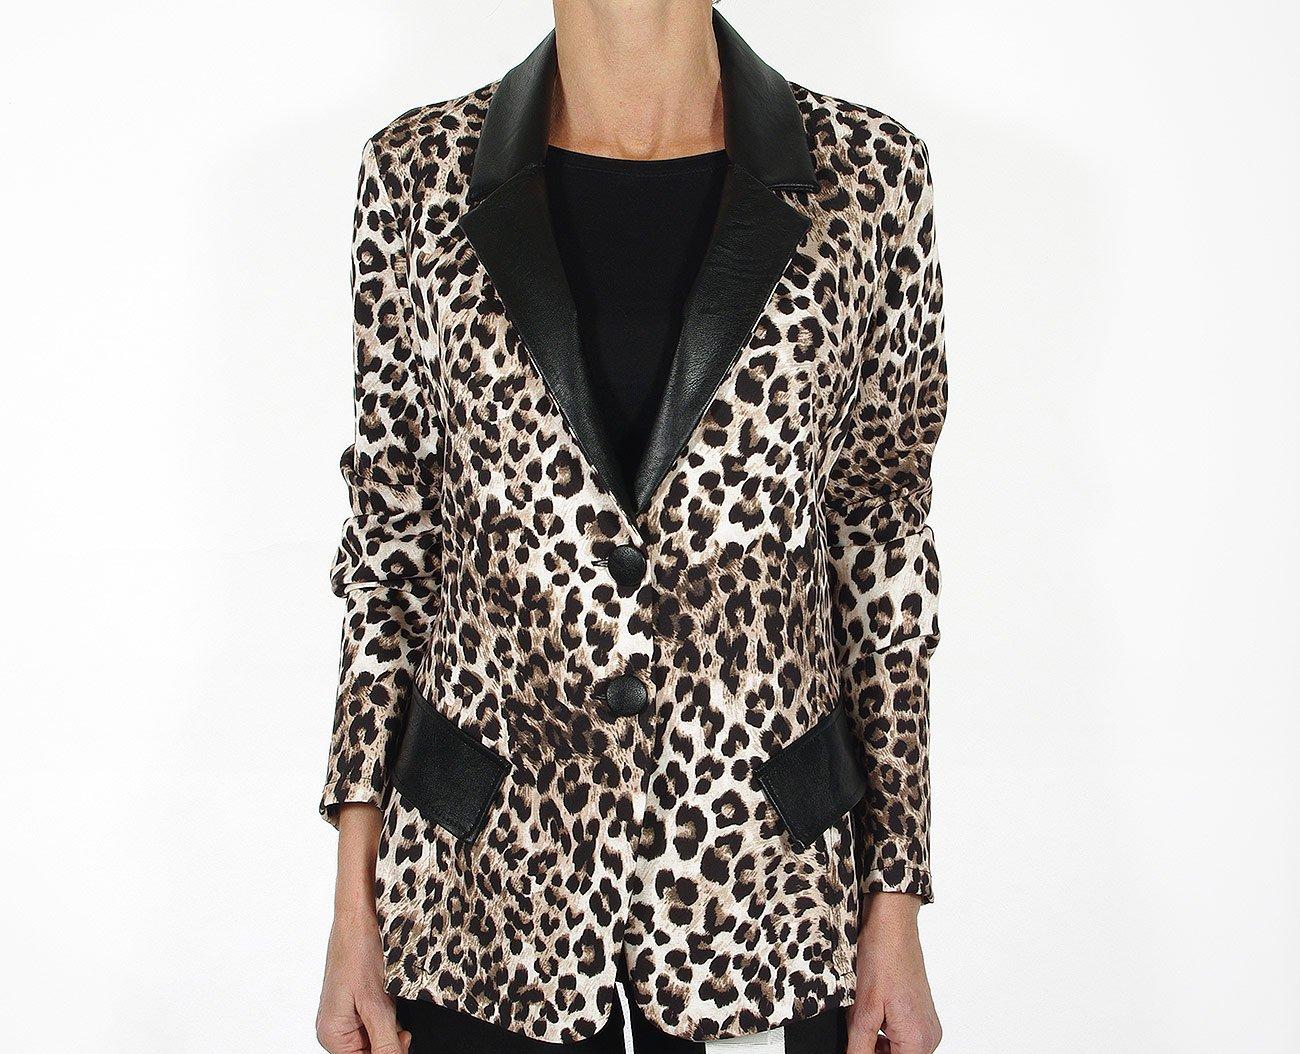 Rinascimento 88964 kurtka giacca nero/beige